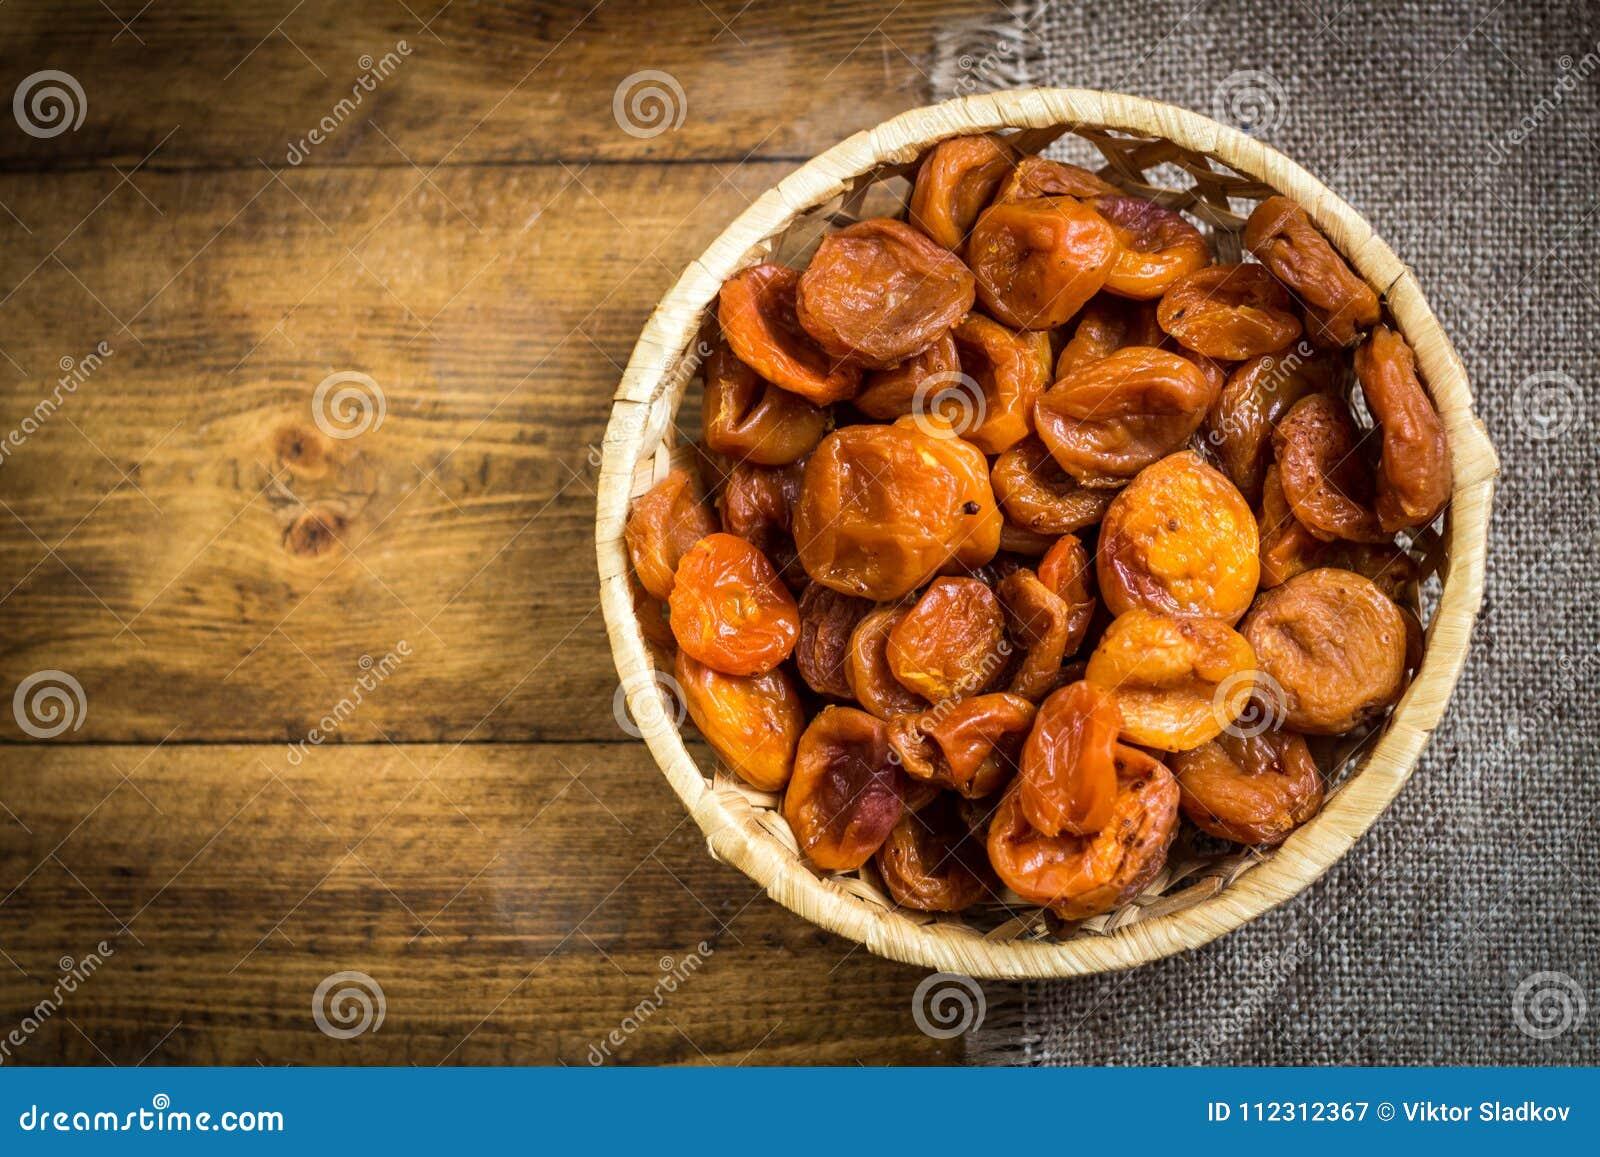 Torkad aprikos-torkad aprikosfrukt